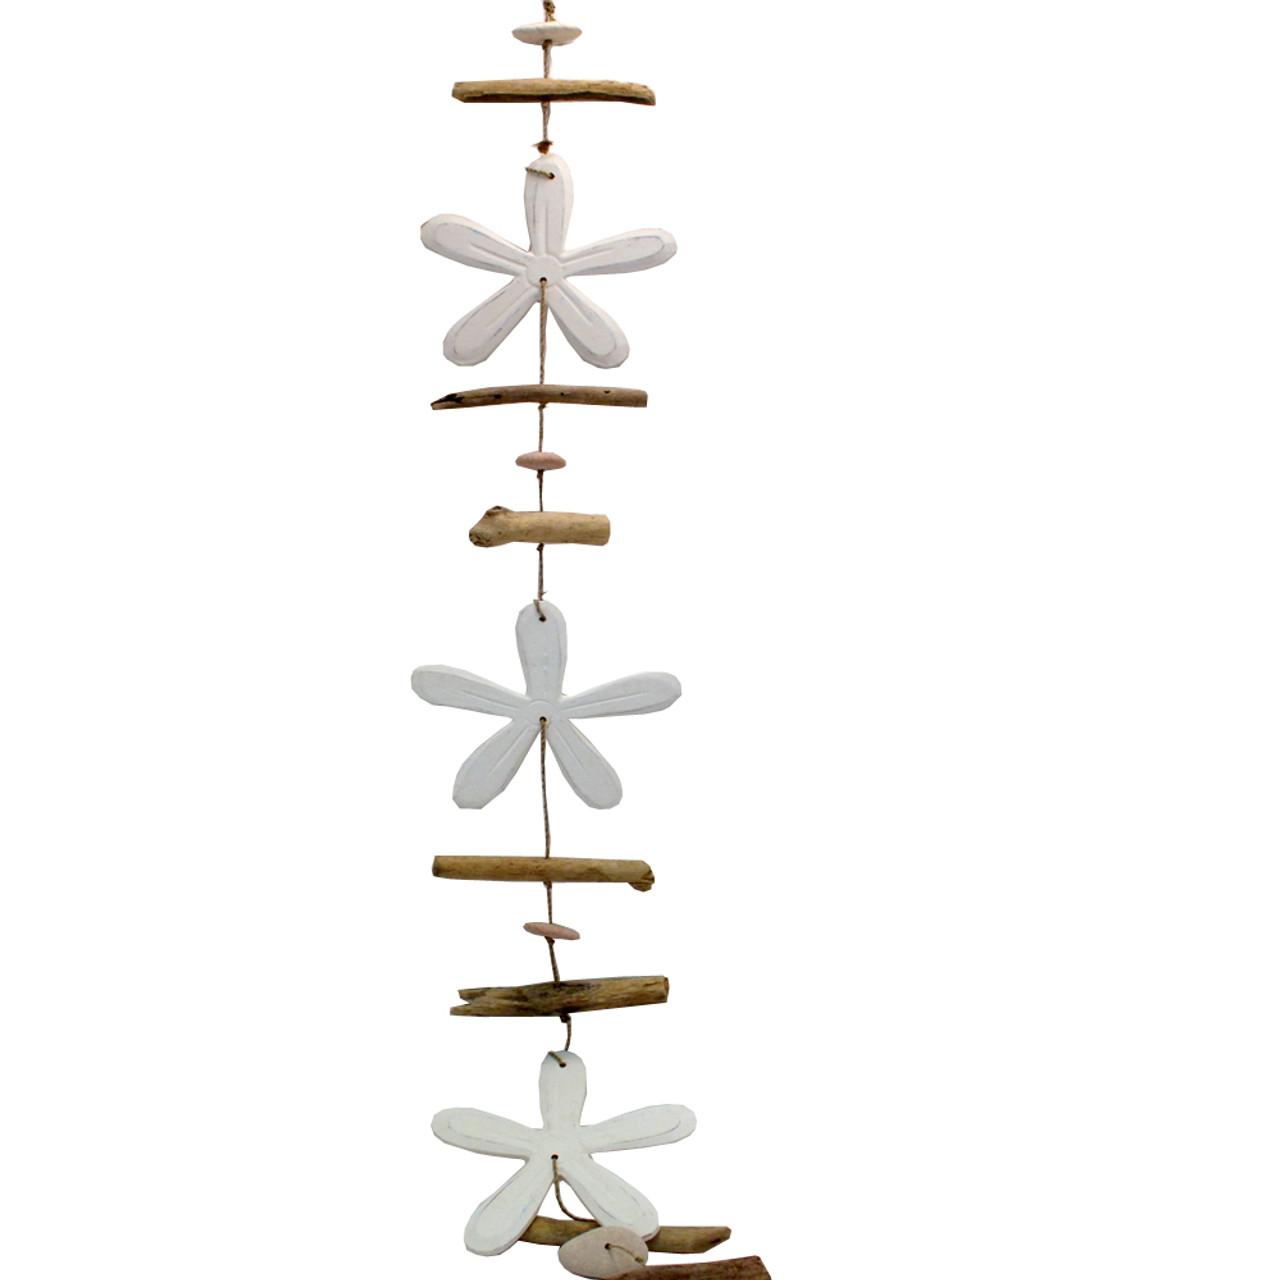 100cm Hanging Wood Decoration Driftwood Decoration Large Driftwood Mobile